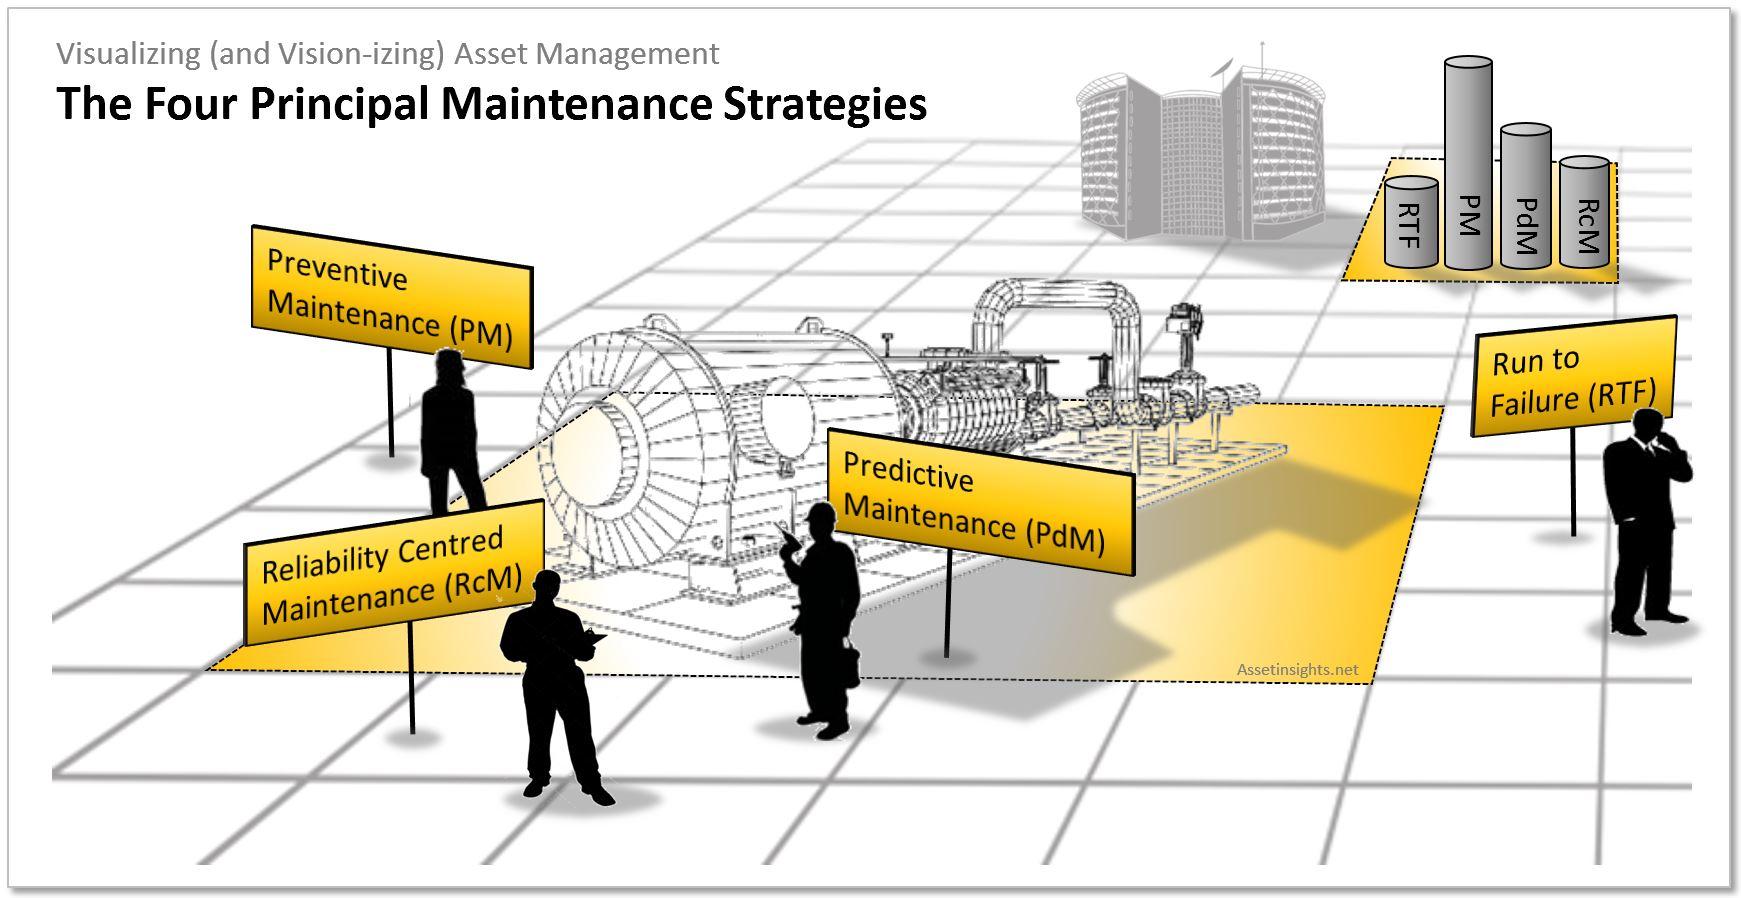 Predictive Maintenance (PdM)